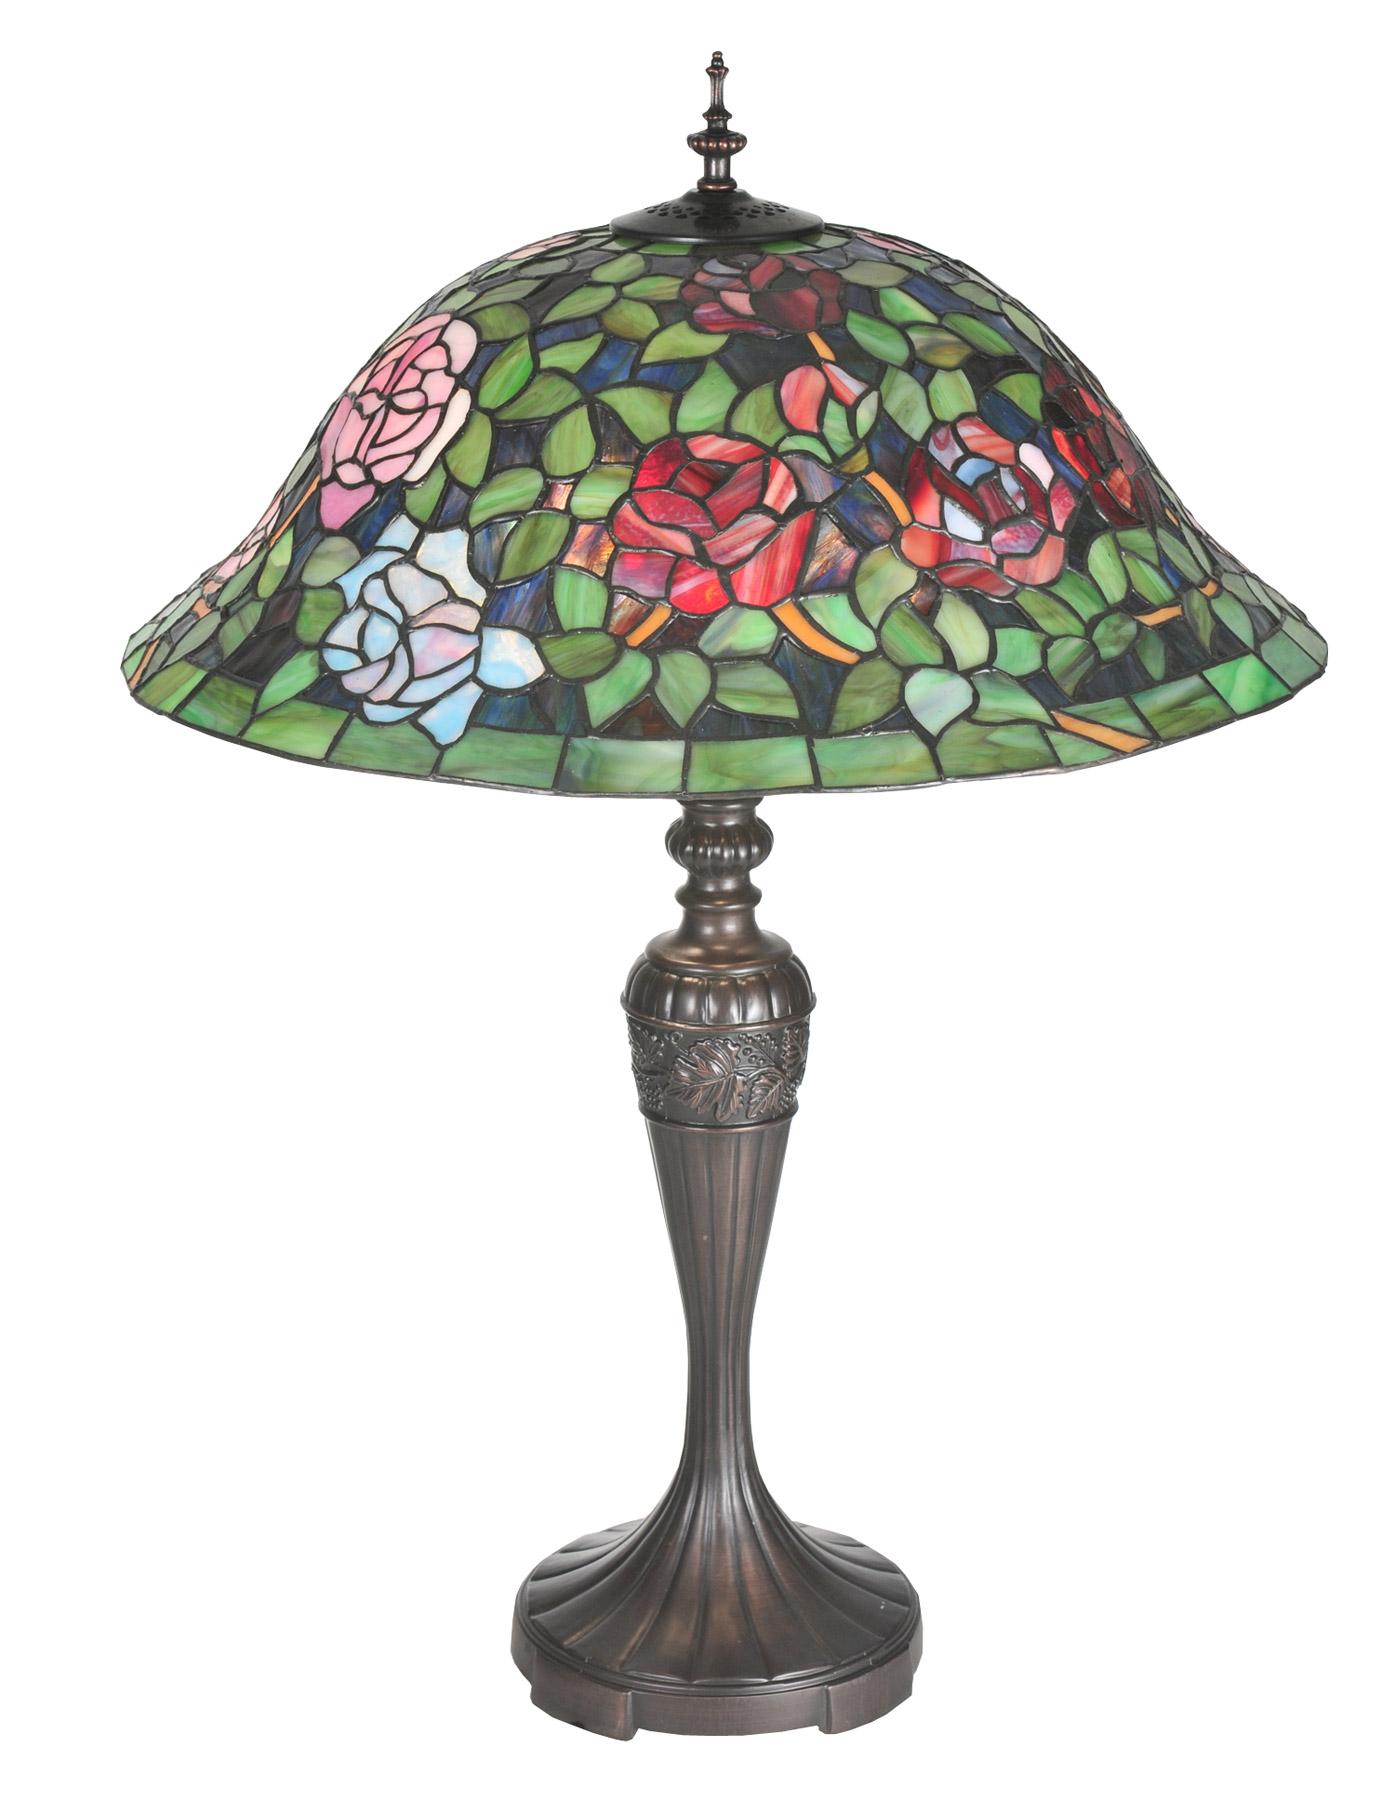 meyda 72443 tiffany rosebush table lamp. Black Bedroom Furniture Sets. Home Design Ideas